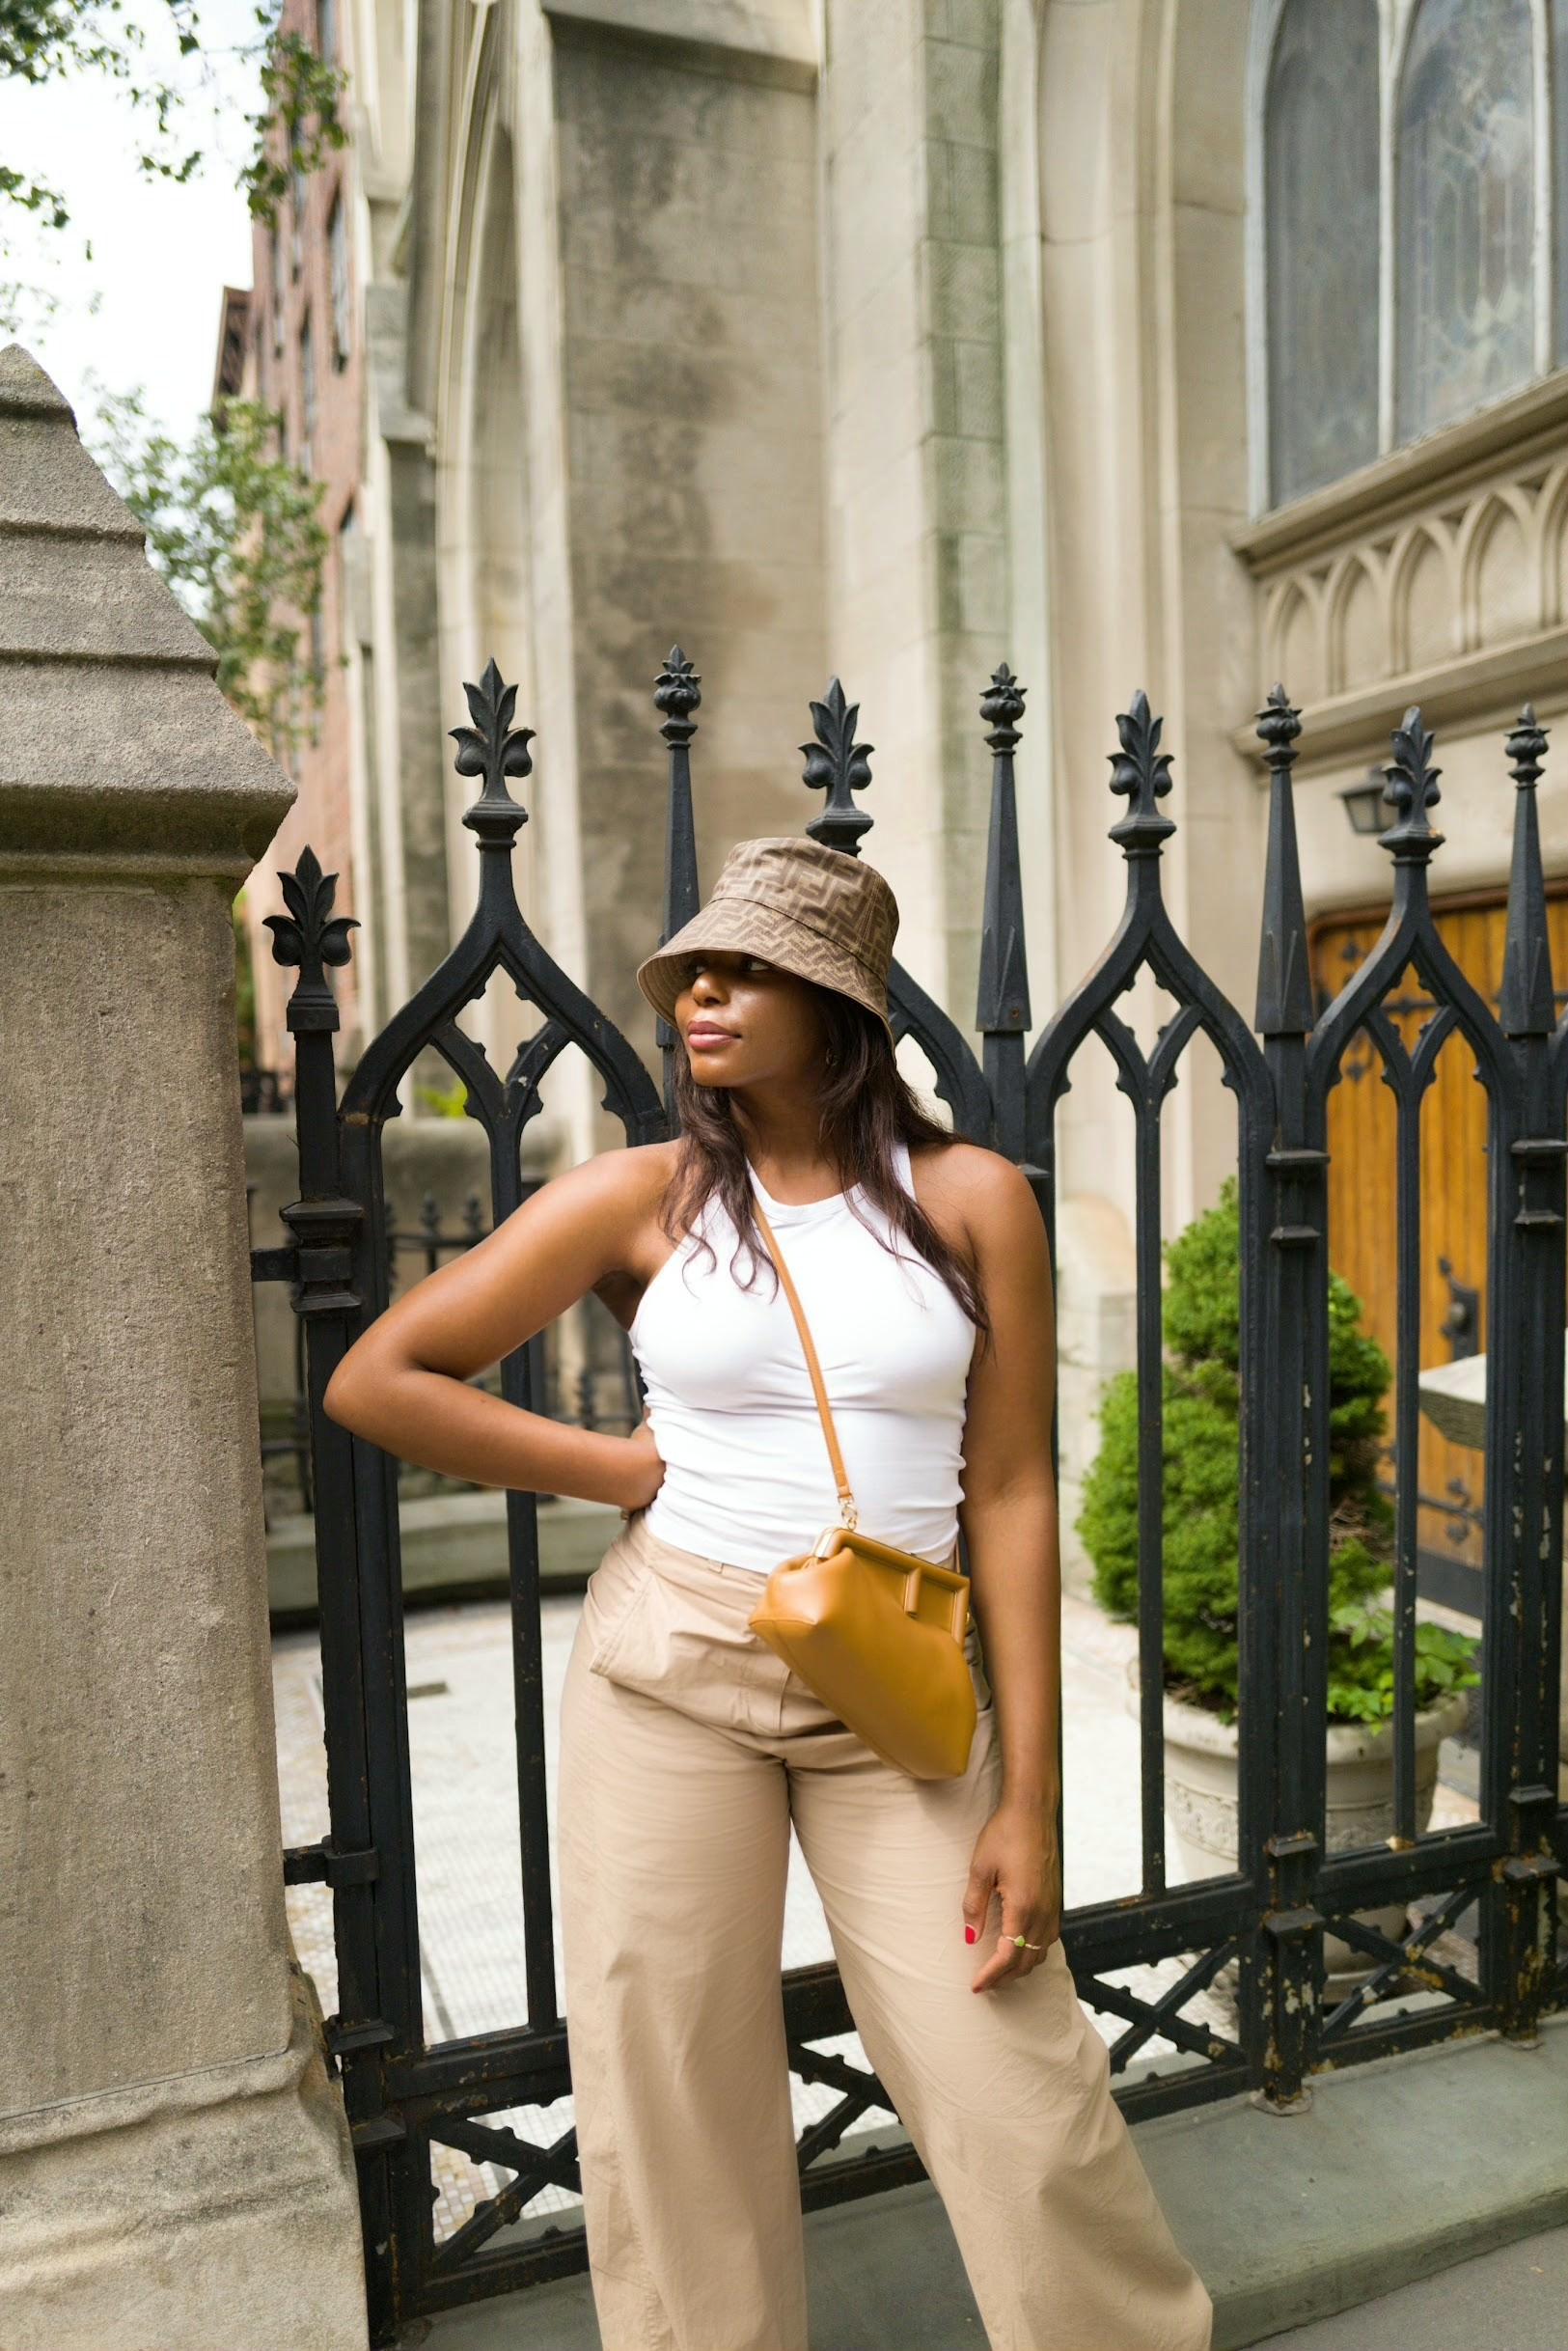 Influencer, Kaye Bassey, in a street style fashion photo wearing a Fendi bucket hat, white tank, wide leg pants and Fendi First handbag.